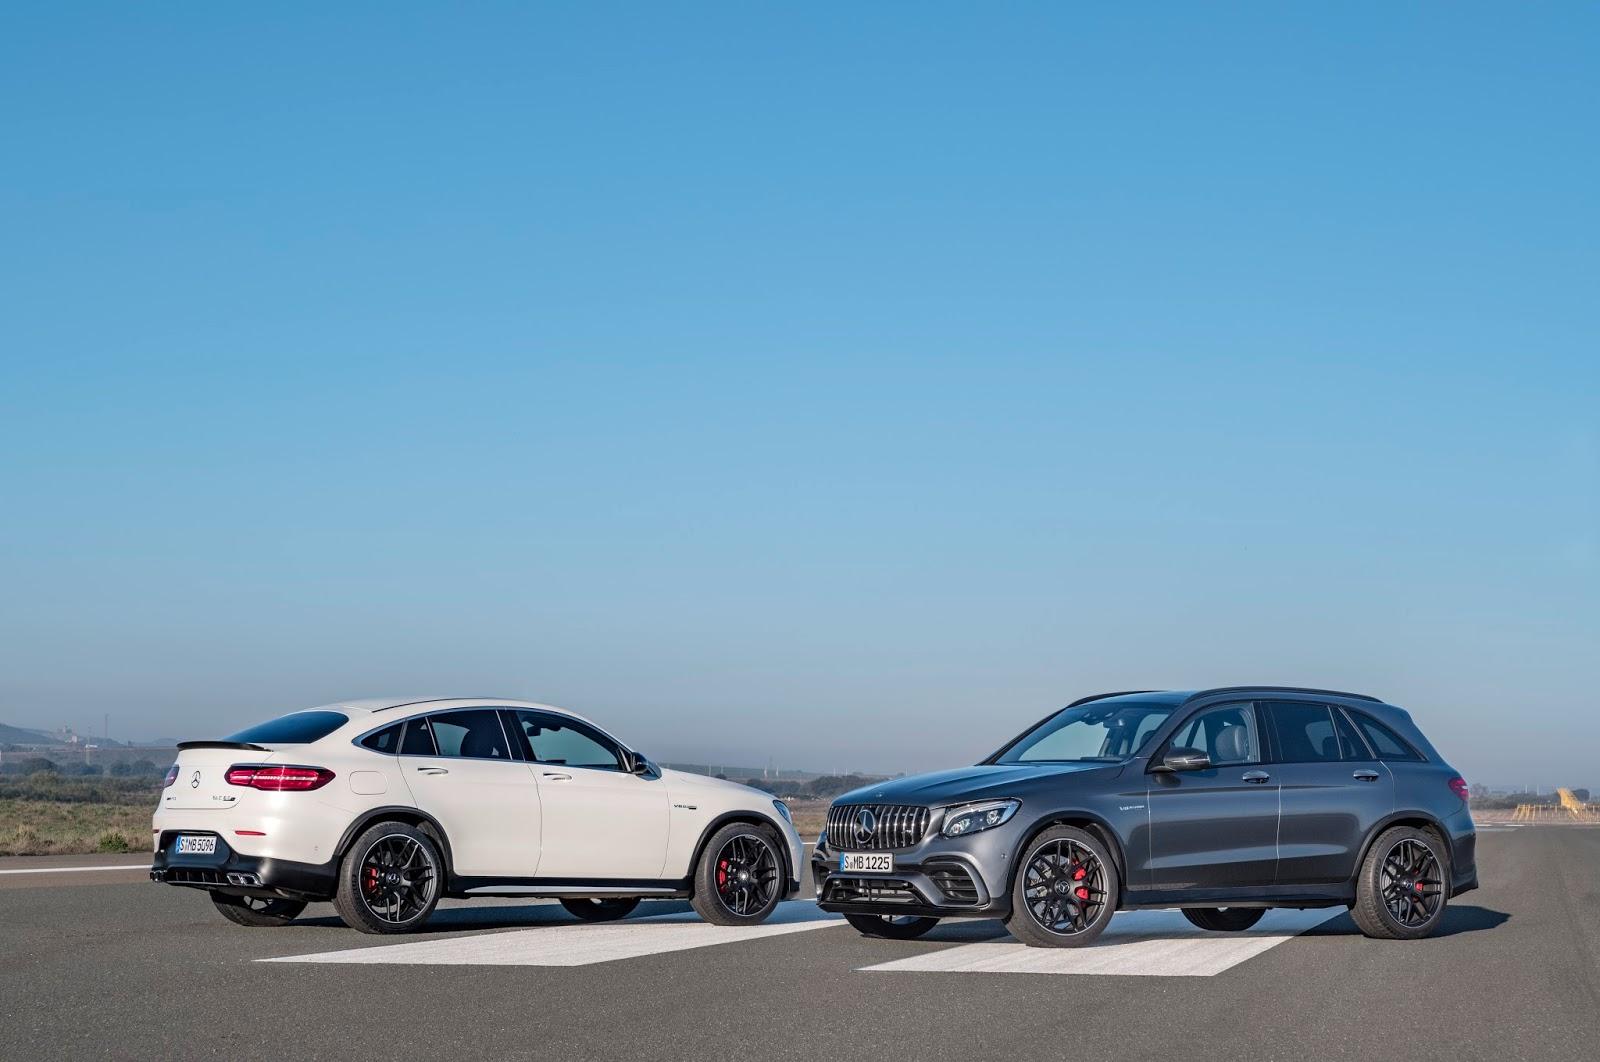 Mercedes-AMG GLC 63 S 4MATIC+ Coupé, designo diamantweiß bright; Mercedes-AMG GLC 63 S 4MATIC+, 2017 ;Kraftstoffverbrauch kombiniert: 10,7  l/100 km; CO2-Emissionen kombiniert: 244  g/kmMercedes-AMG GLC 63 S 4MATIC+ Coupé, designo diamond white bright ; Mercedes-AMG GLC 63 S 4MATIC+, 2017; Fuel consumption combined: 10.7 l/100 km; combined CO2 emissions: 244 g/km